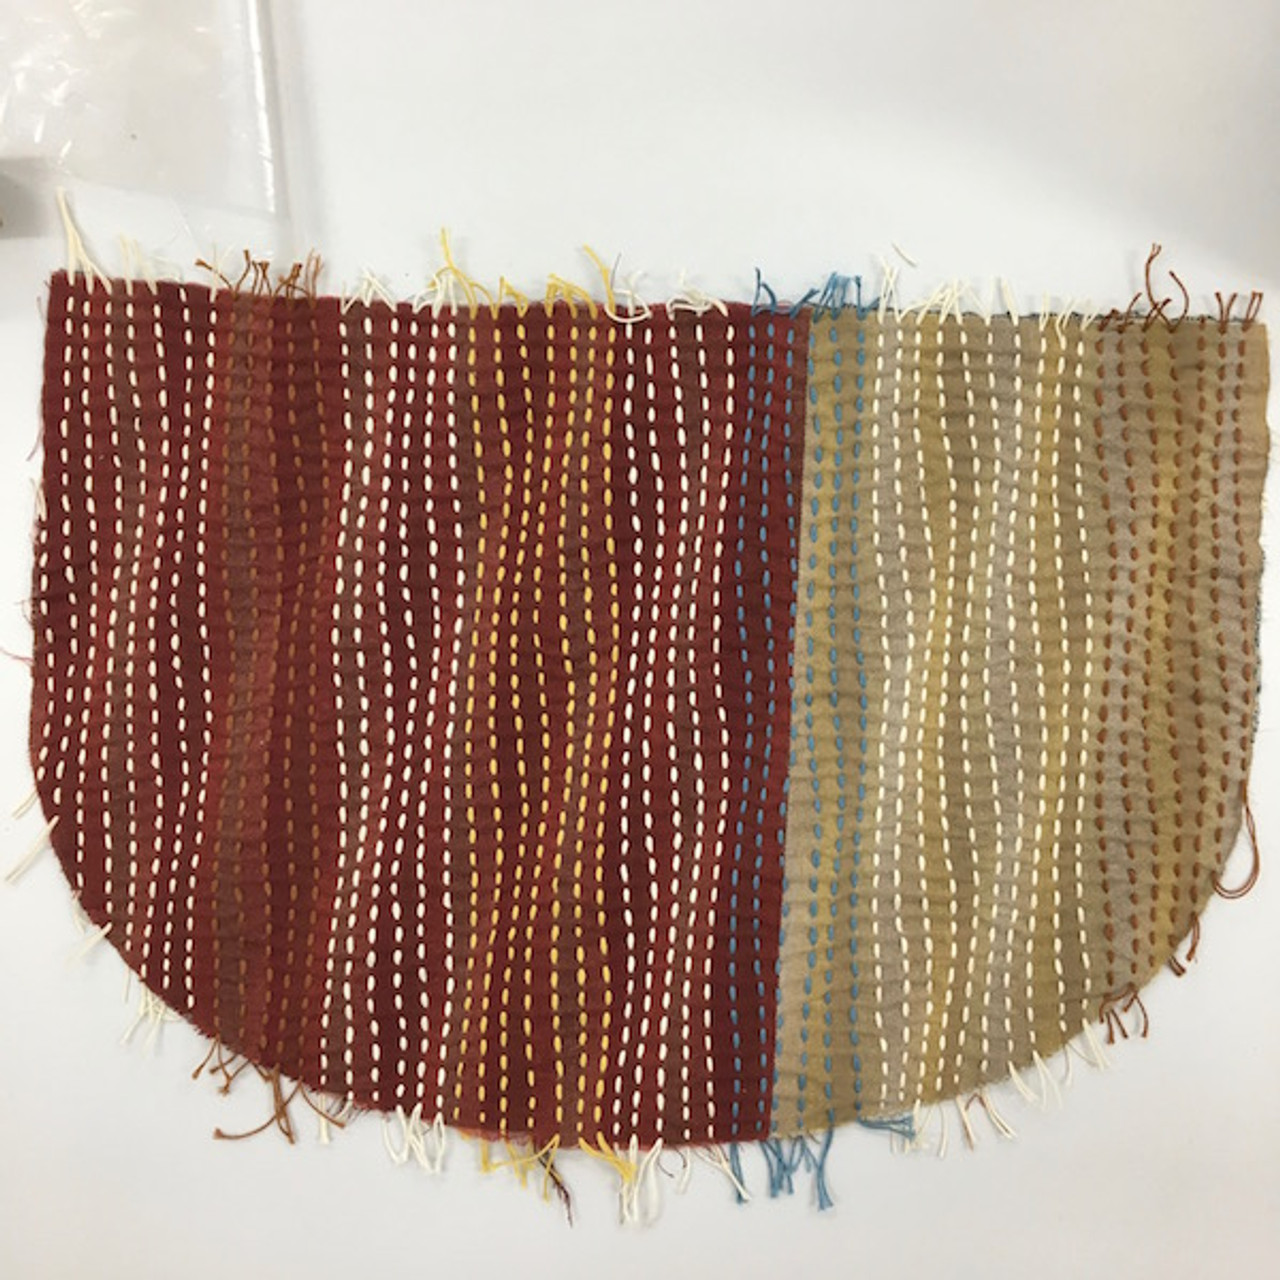 Raindrop Bag Pattern Kt-74 - Bebe Bold Japanese Textiles  Craft-5854